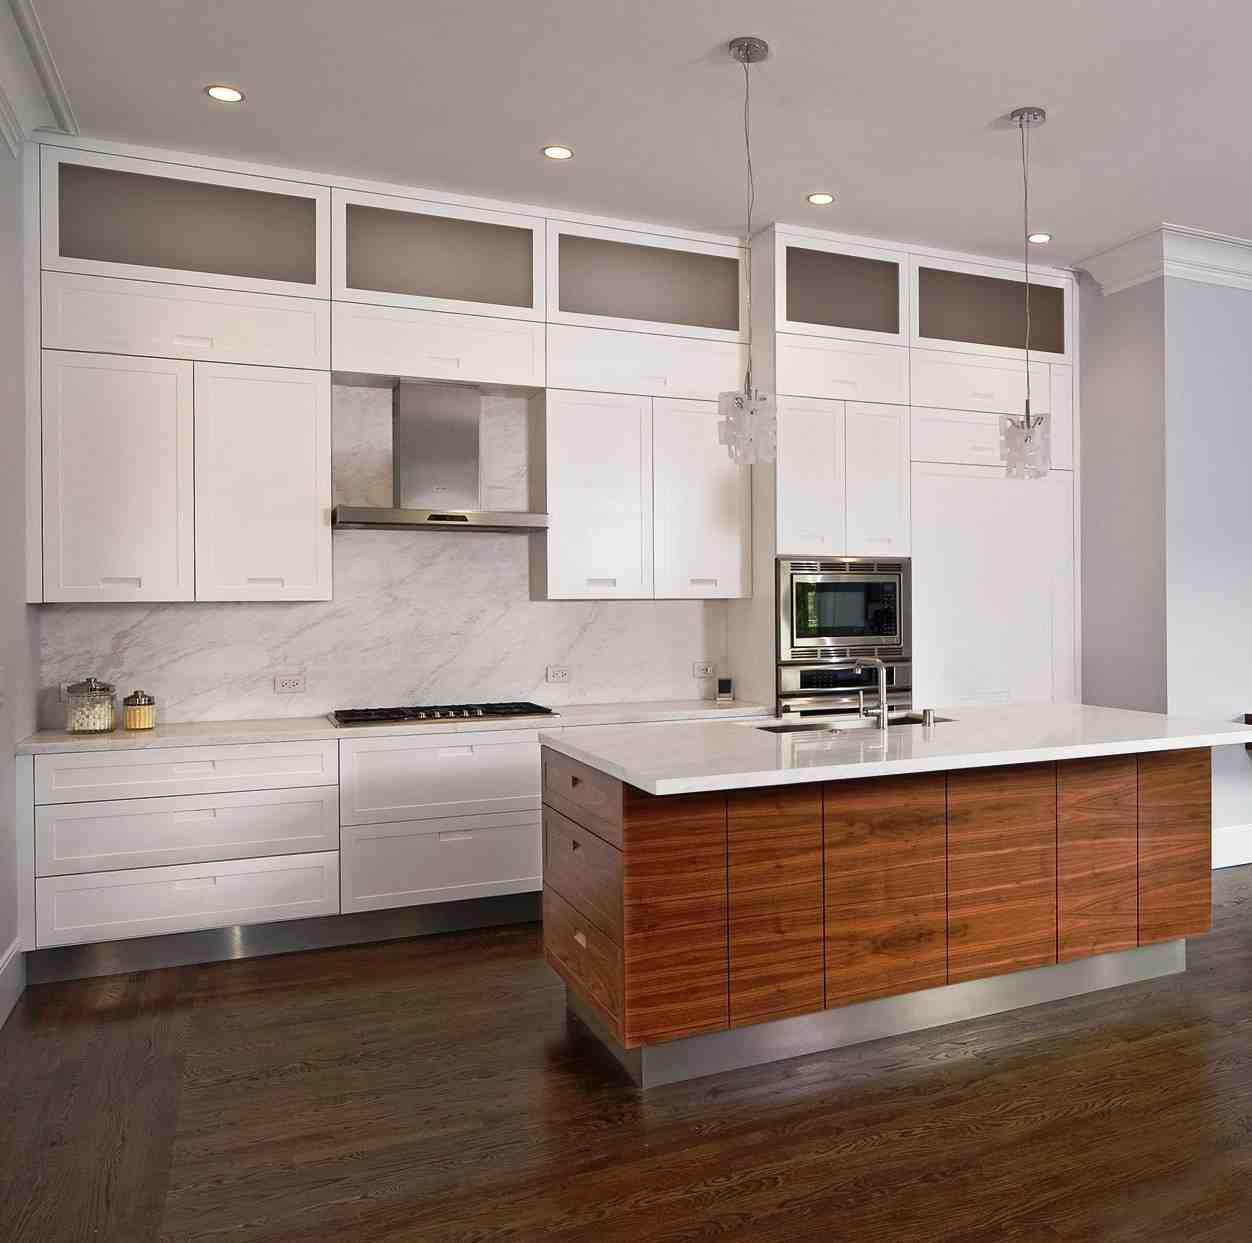 frameless kitchen cabinets sink drain catcher rta home furniture design